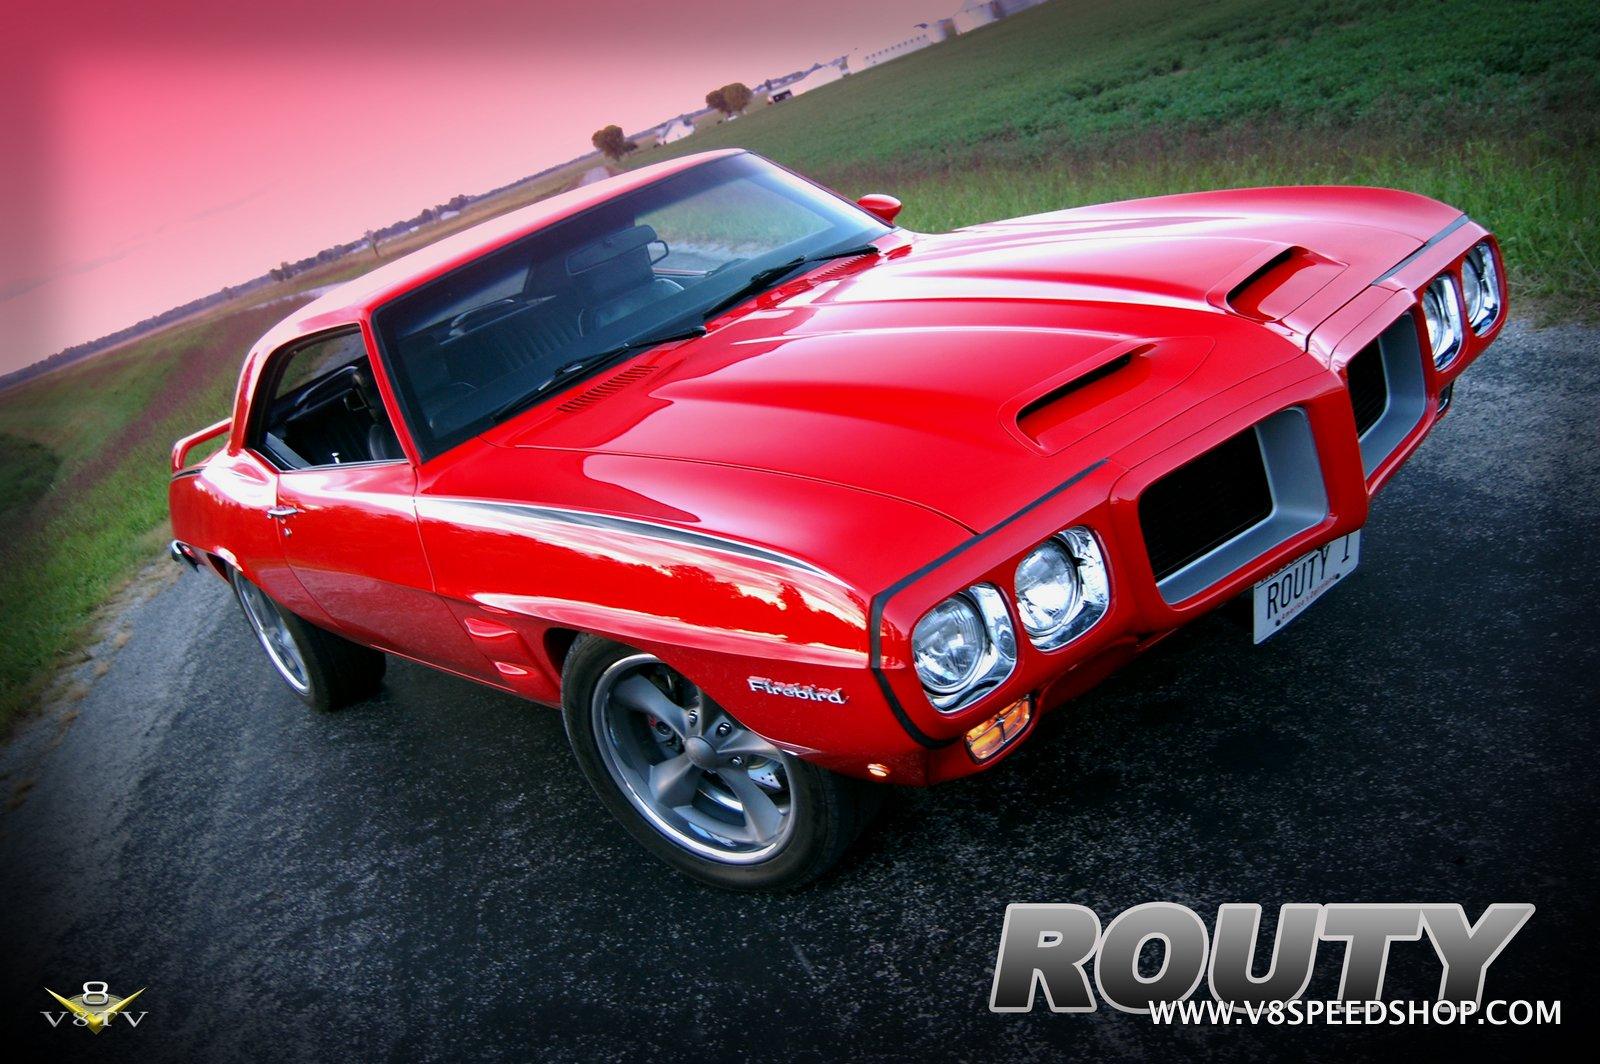 "1969 Pontiac Firebird ""Routy"" Restoration at V8 Speed & Resto Shop"